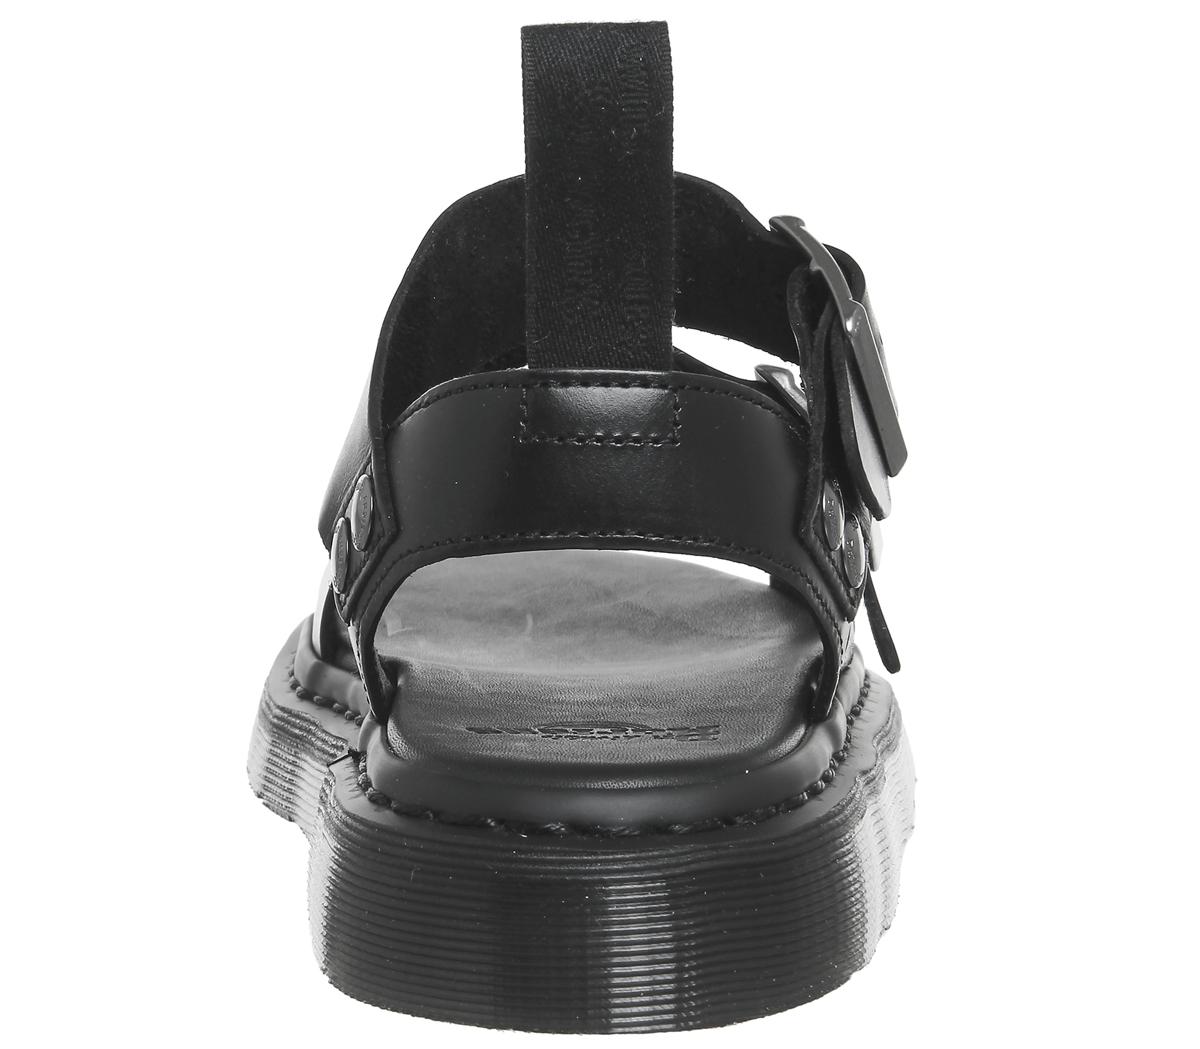 Womens Dr. Dr. Dr. Martens Gryphon Sandals Black Brando Leather Sandals 1ade22